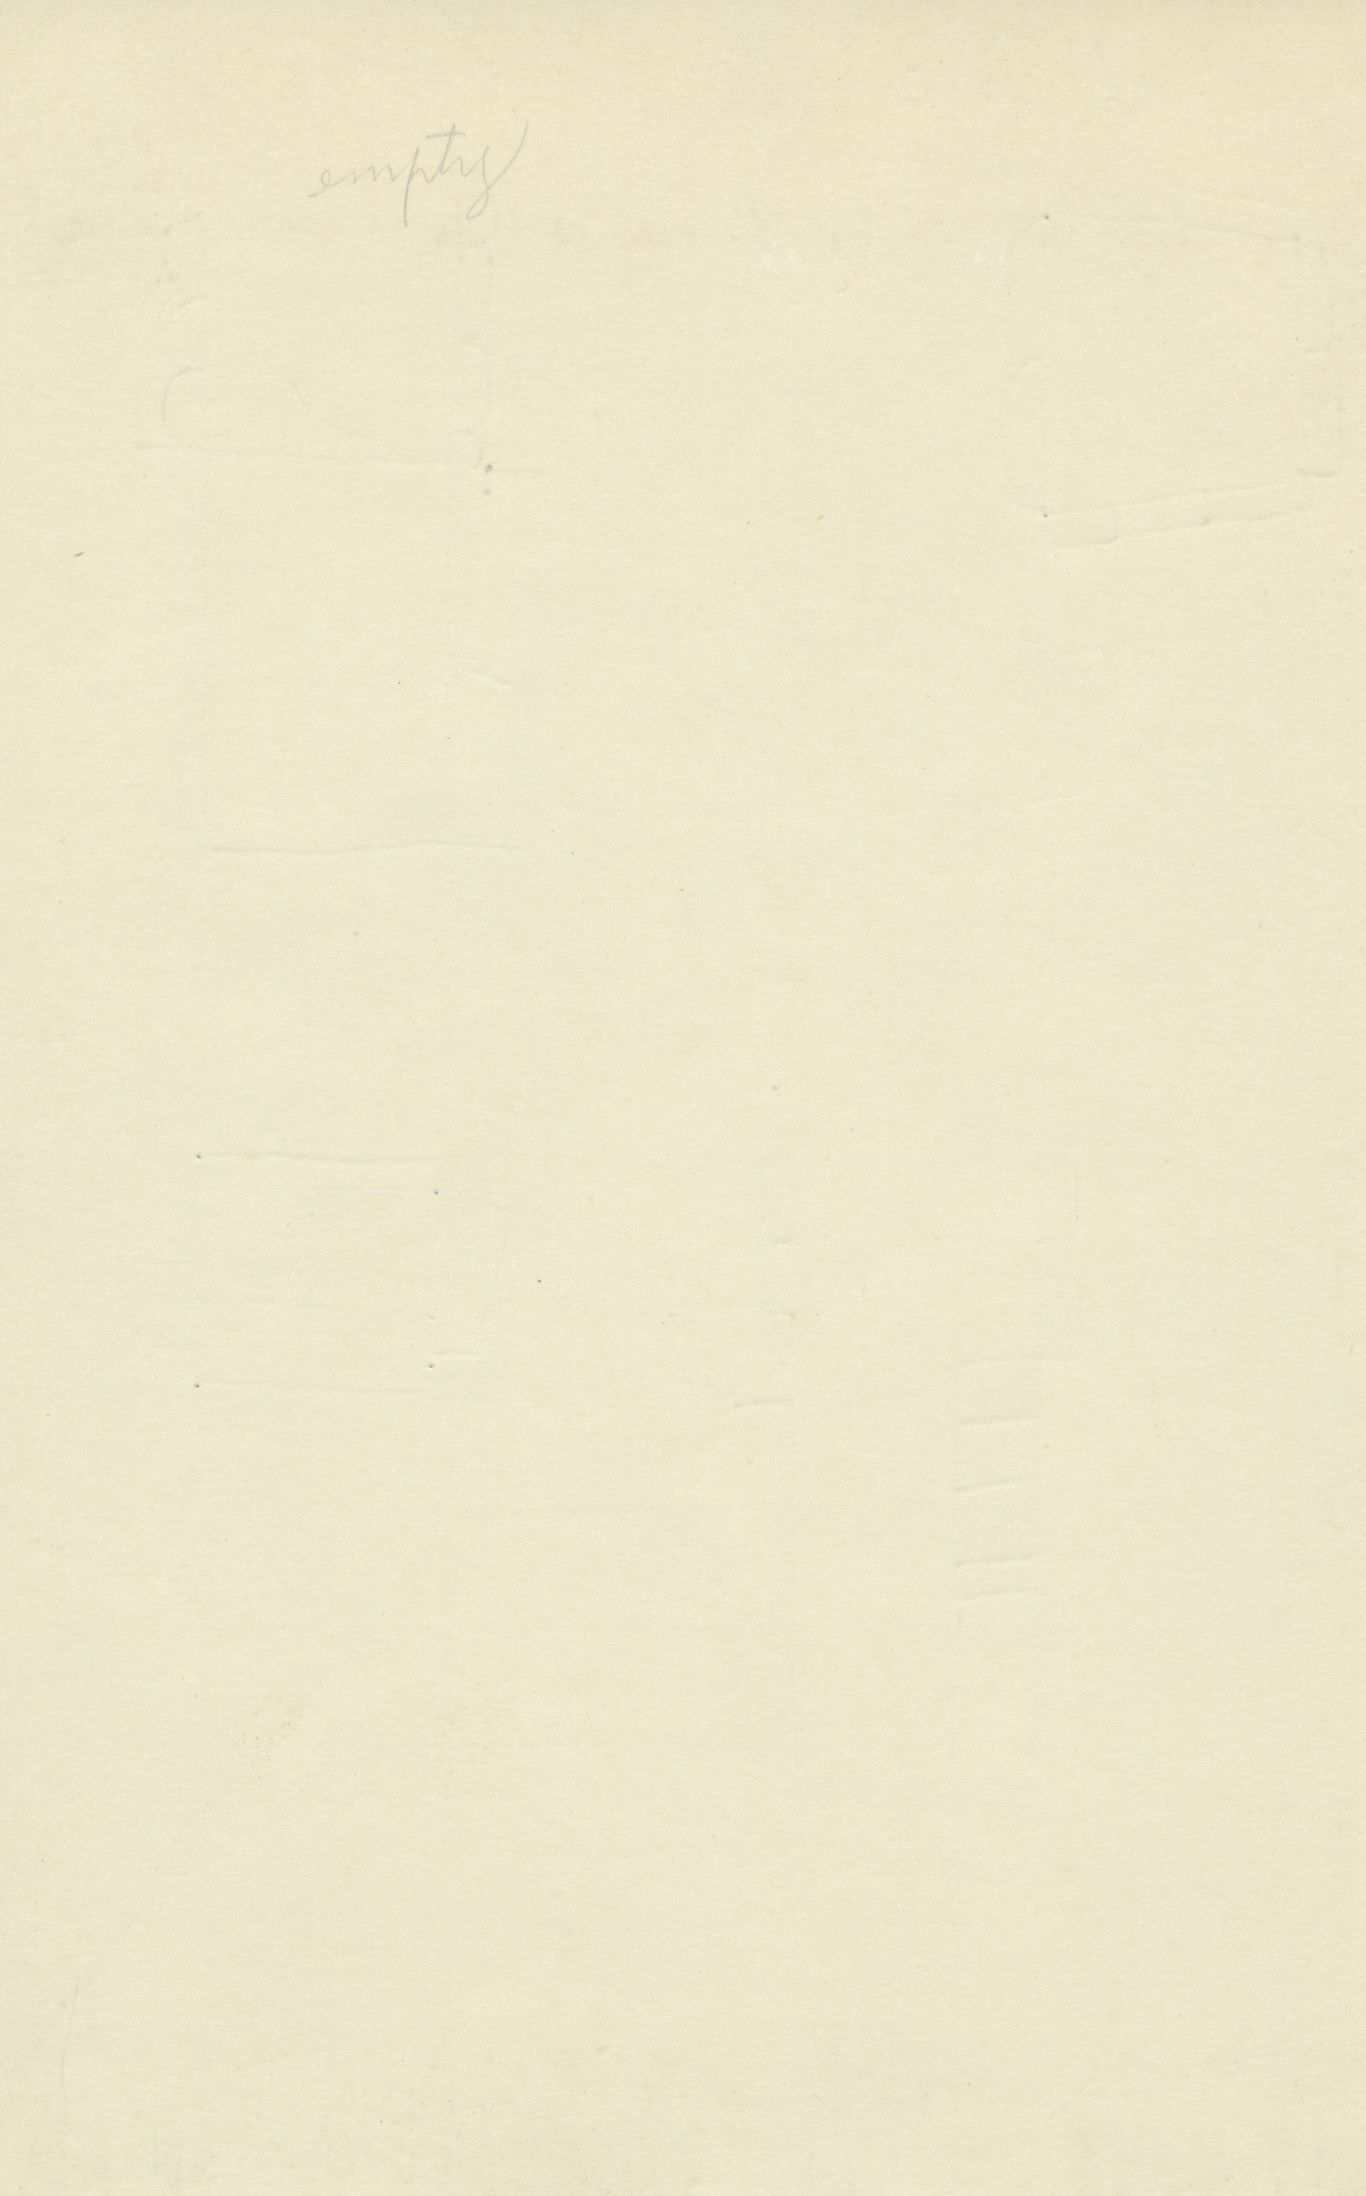 Notes: G 2188, Shaft B, notes